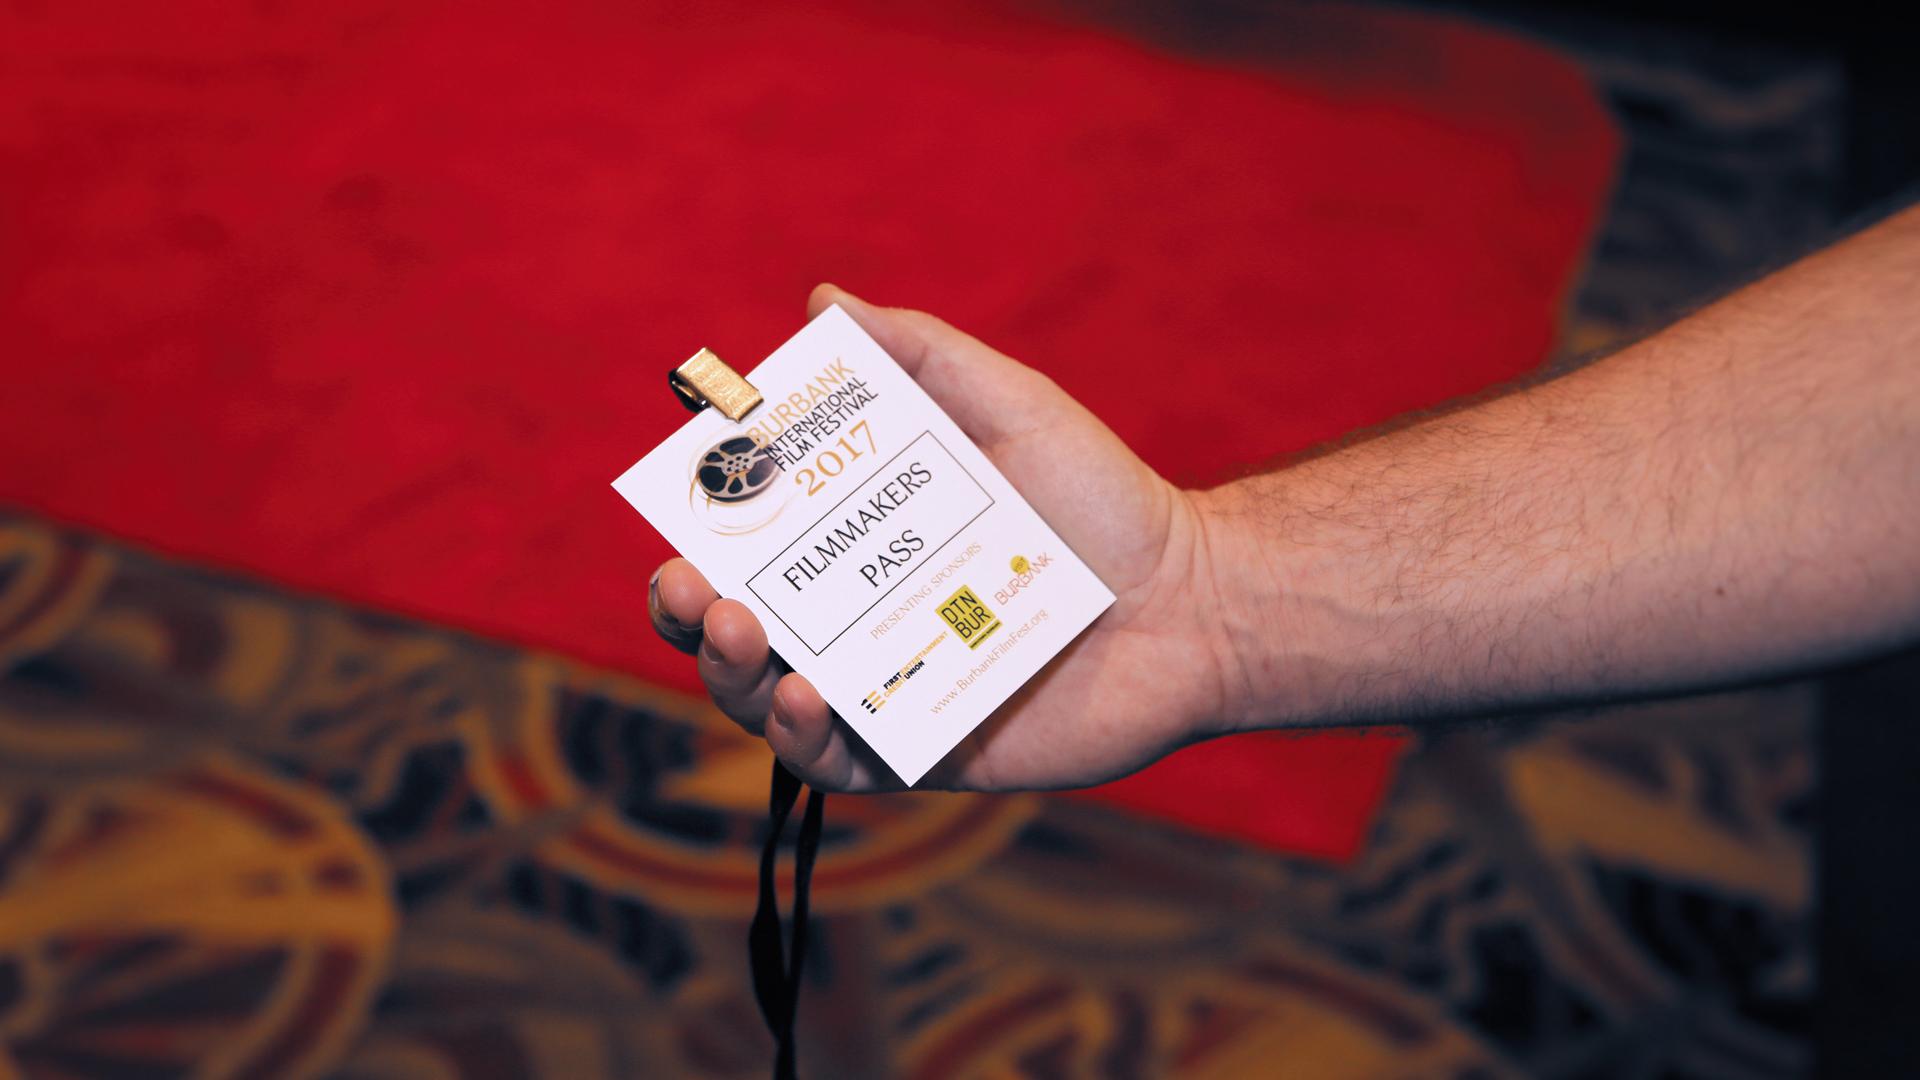 Burbank Intl Film Festival